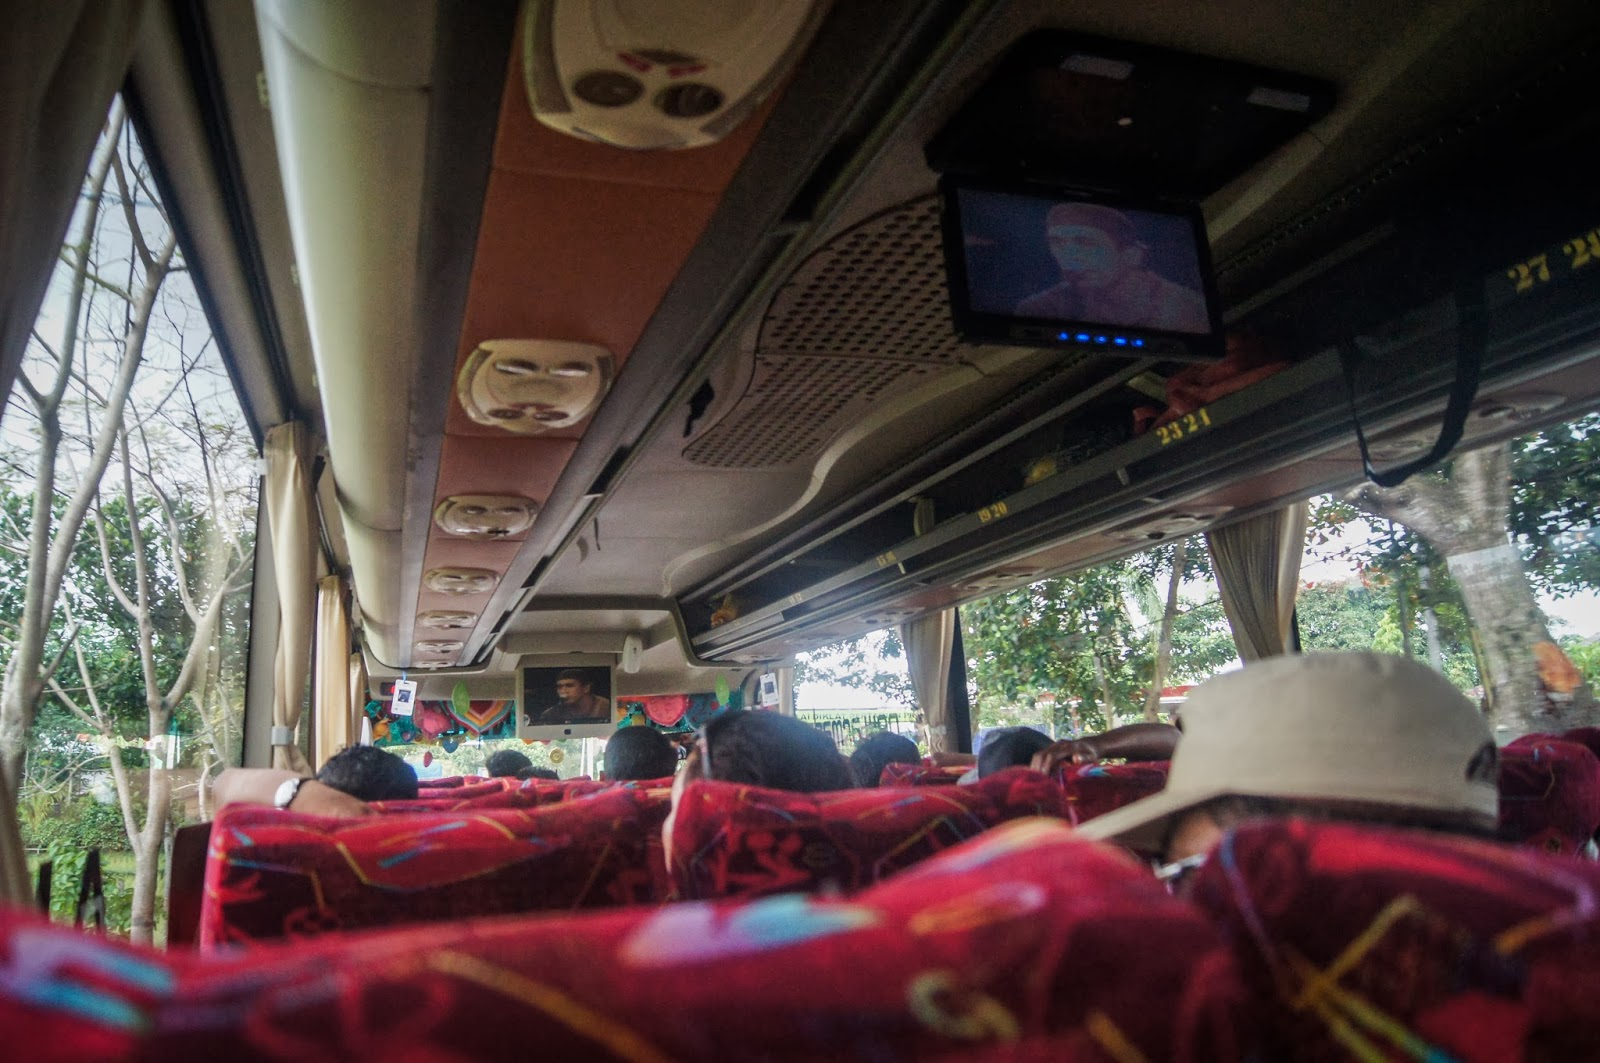 karakoke en el autobus indonesia